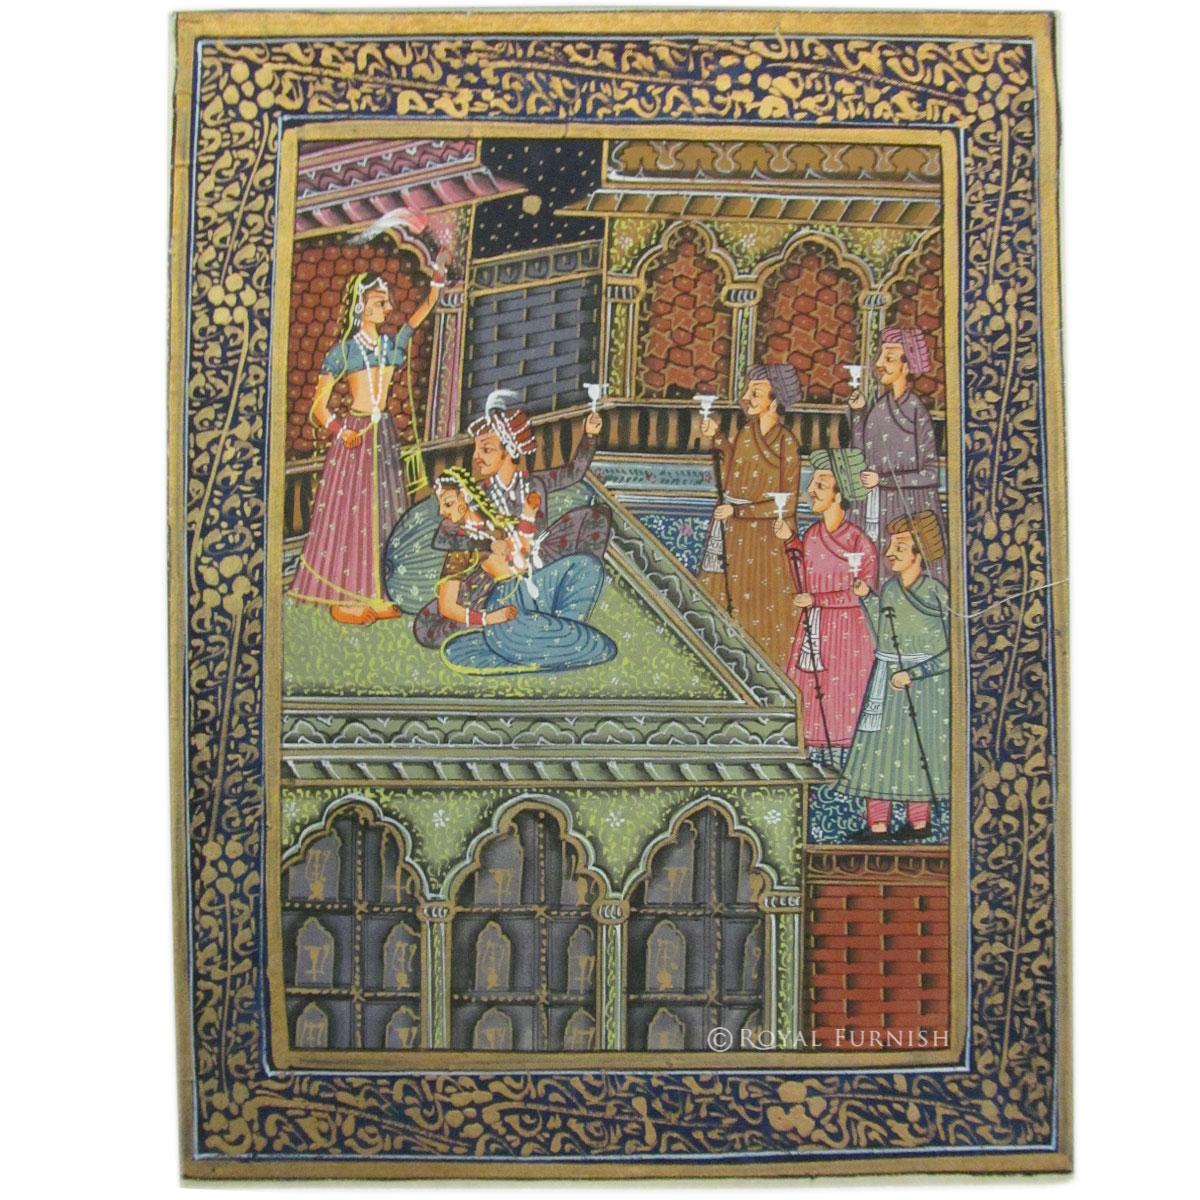 Indian Mughal King Love Scene Rajasthan Miniature Painting